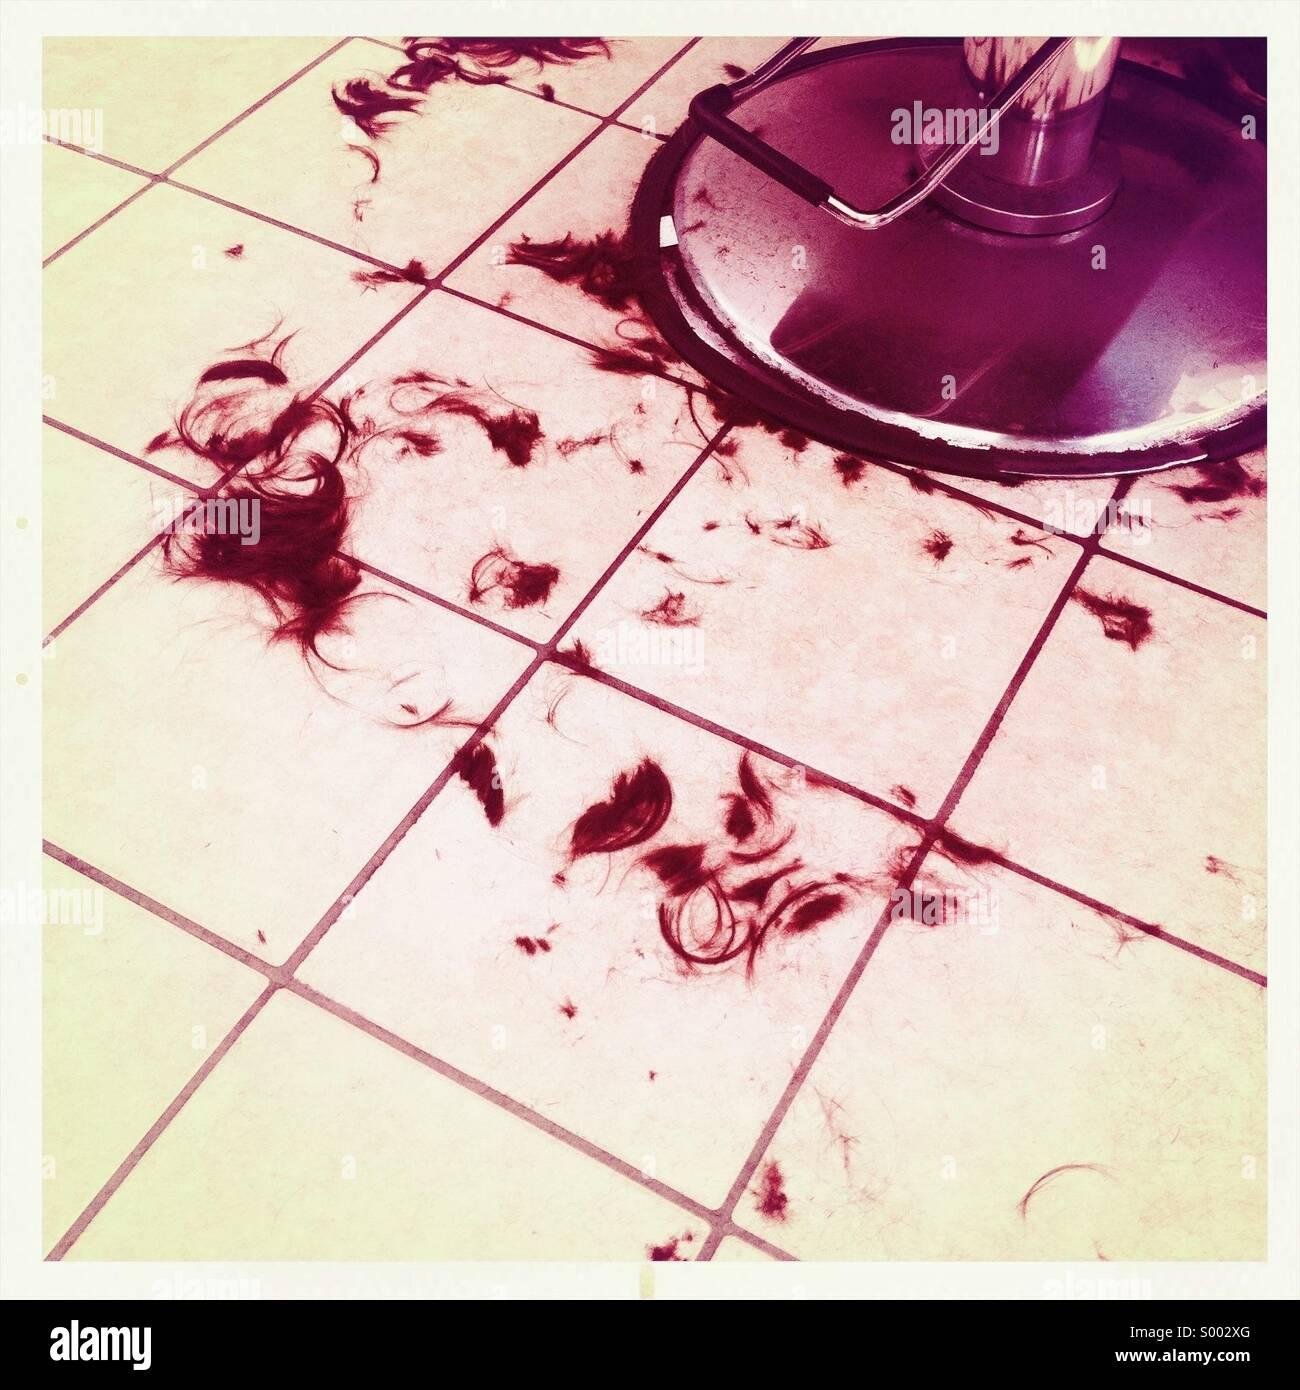 The floor beneath a haircut chair - Stock Image